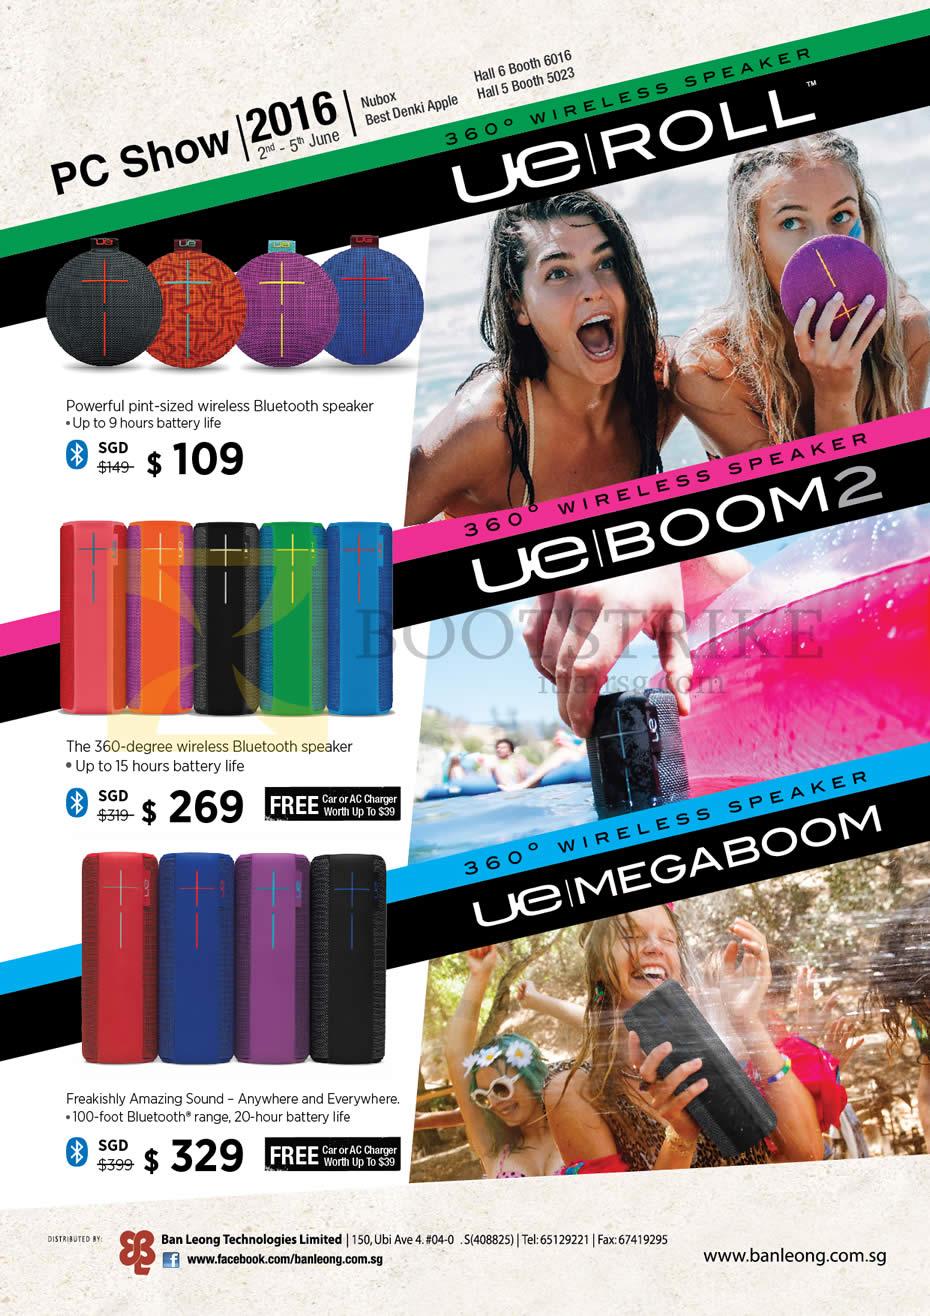 PC SHOW 2016 price list image brochure of Logitech Wireless Speakers UE Roll, UE Boom2, UE Megaboom